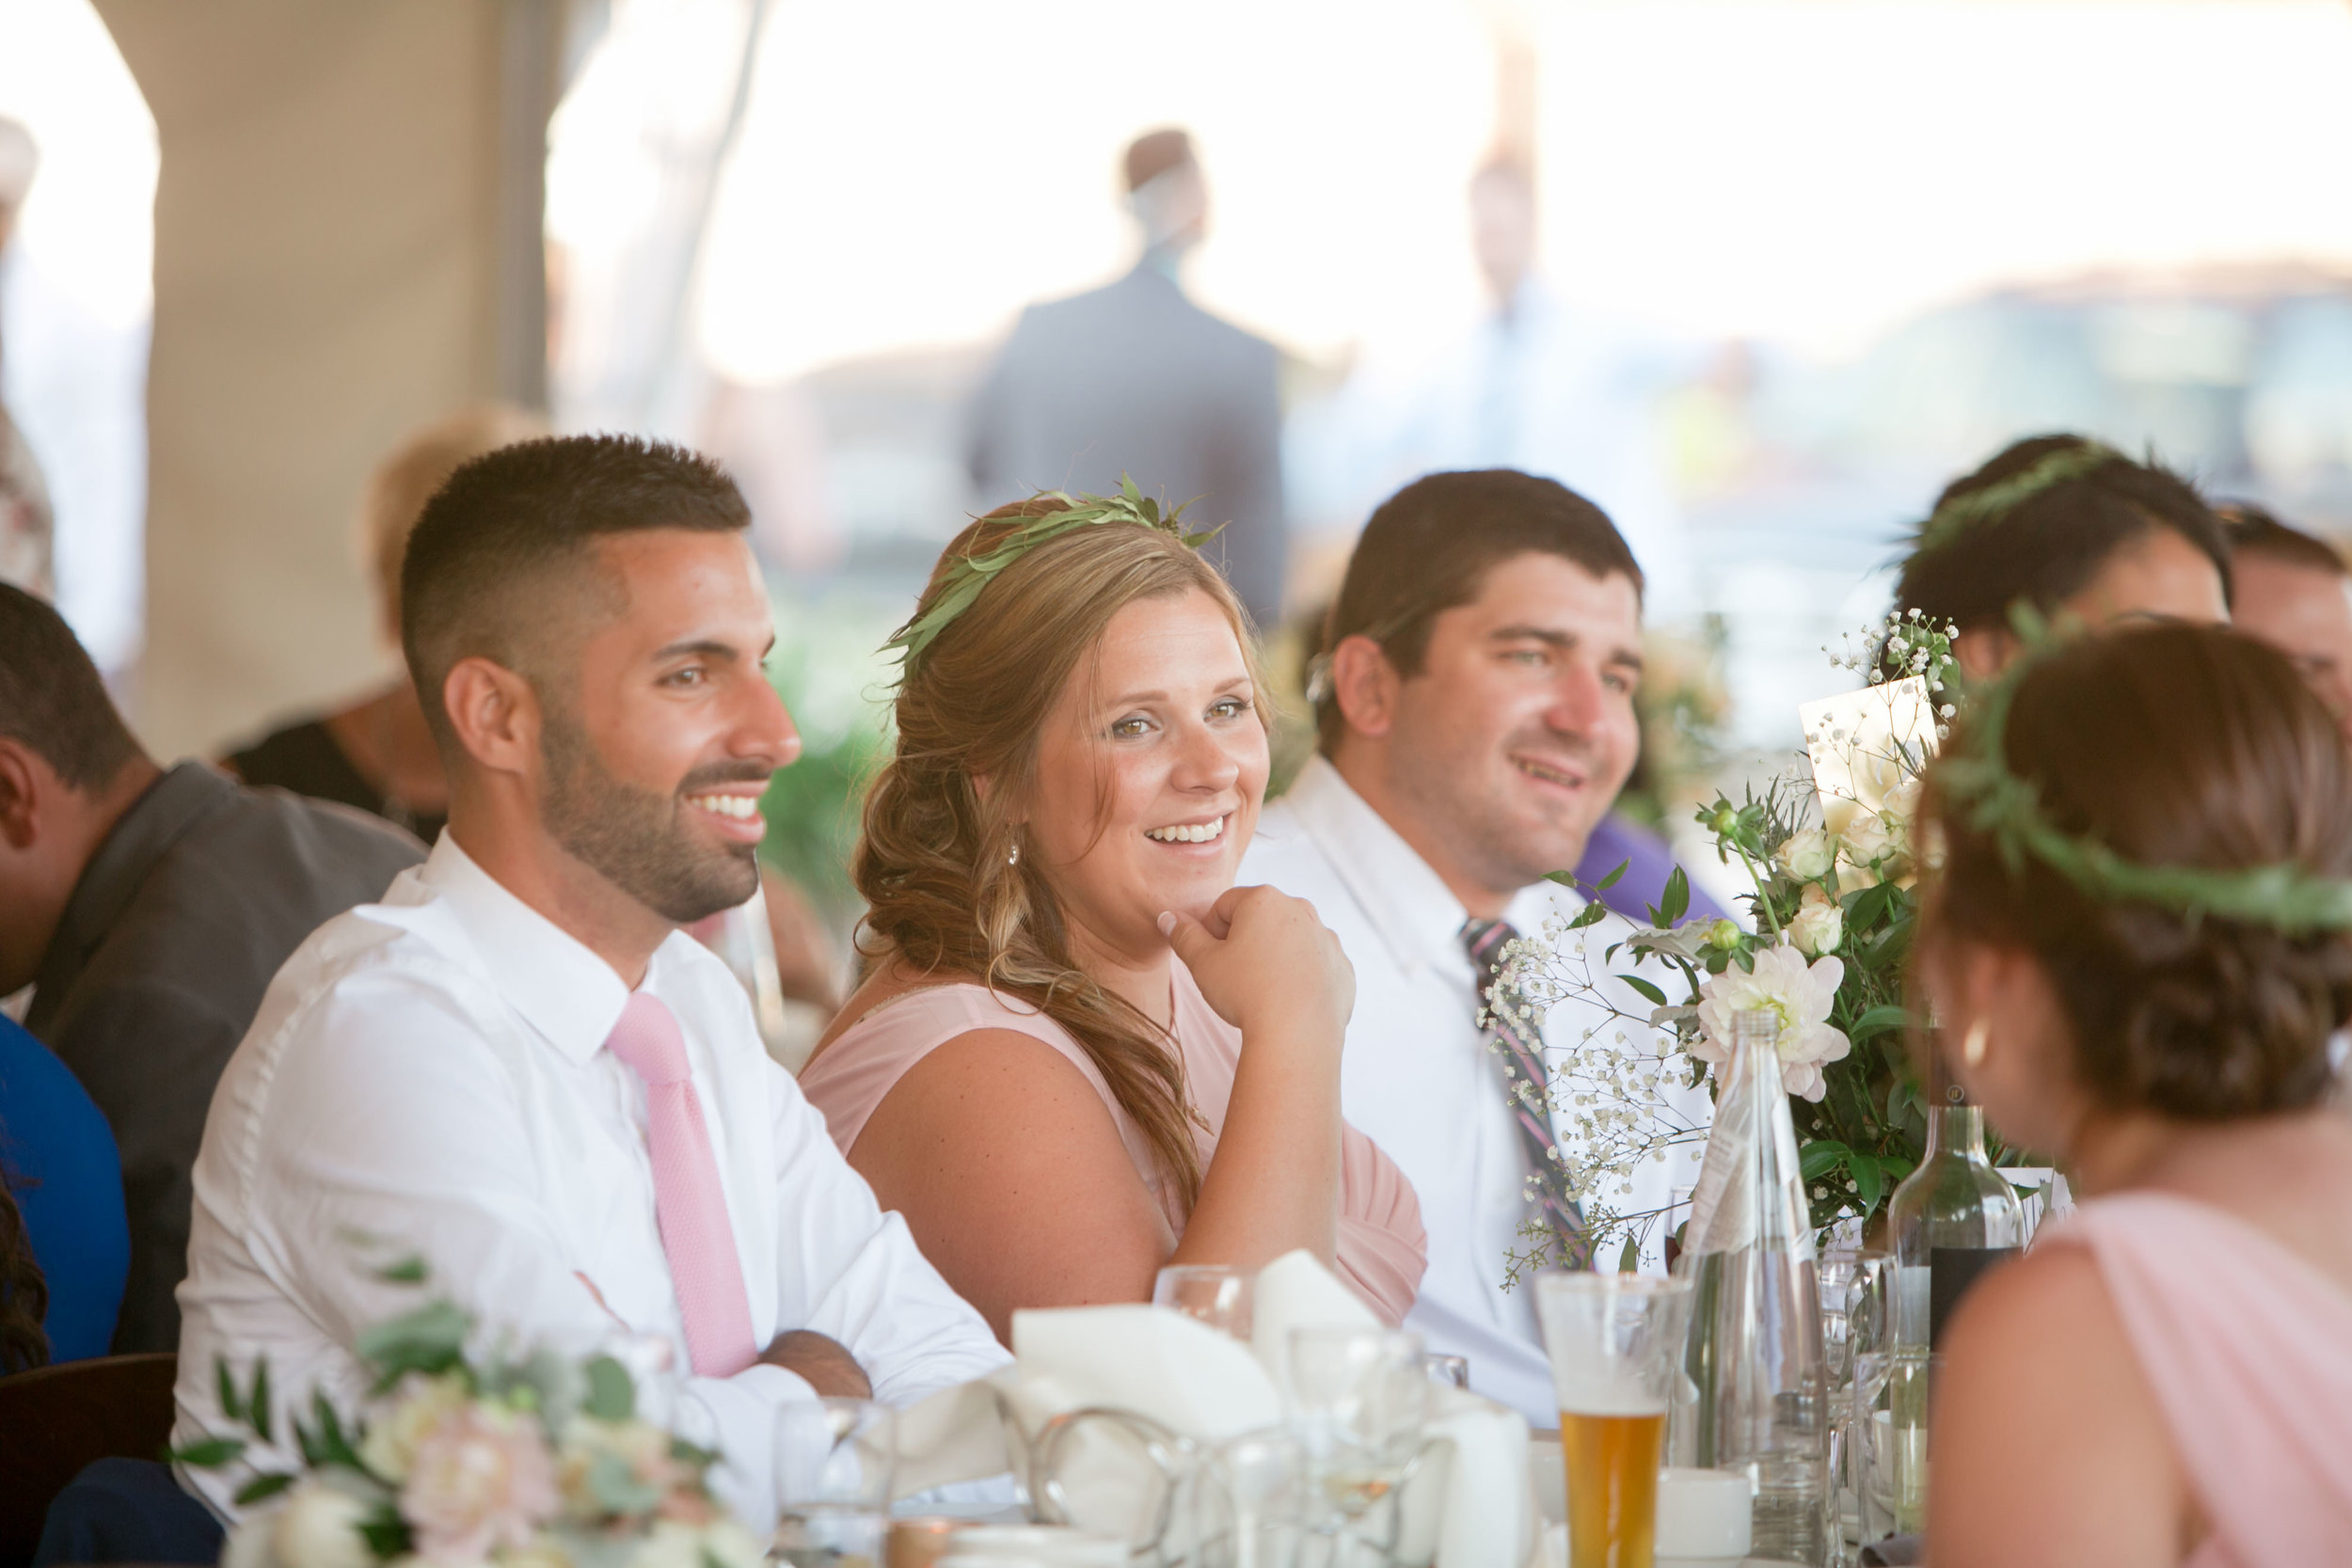 Kimberley + Cameron - Daniel Ricci Weddings - High Res. Finals-548.jpg